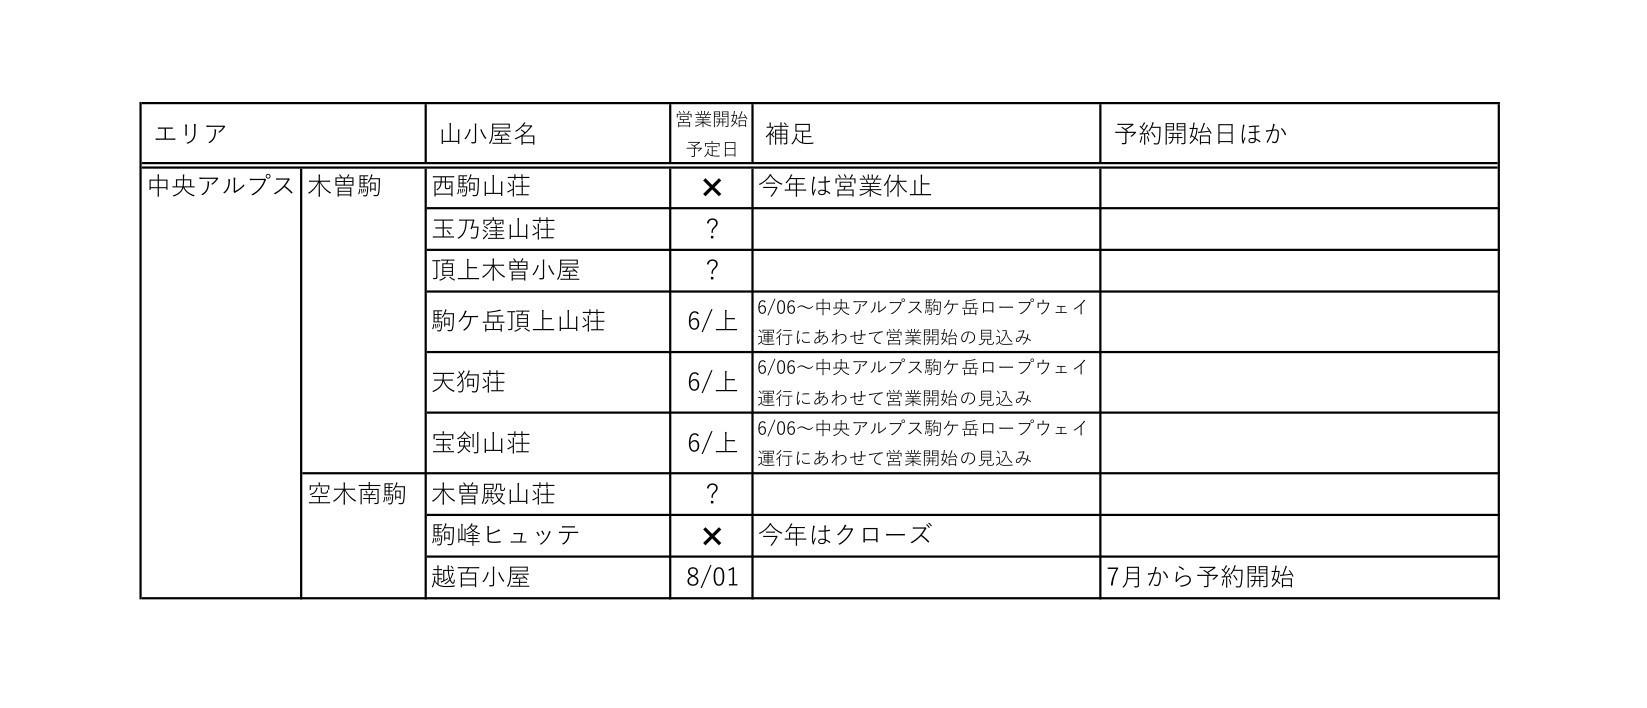 yamagoya_chuo0528.jpg